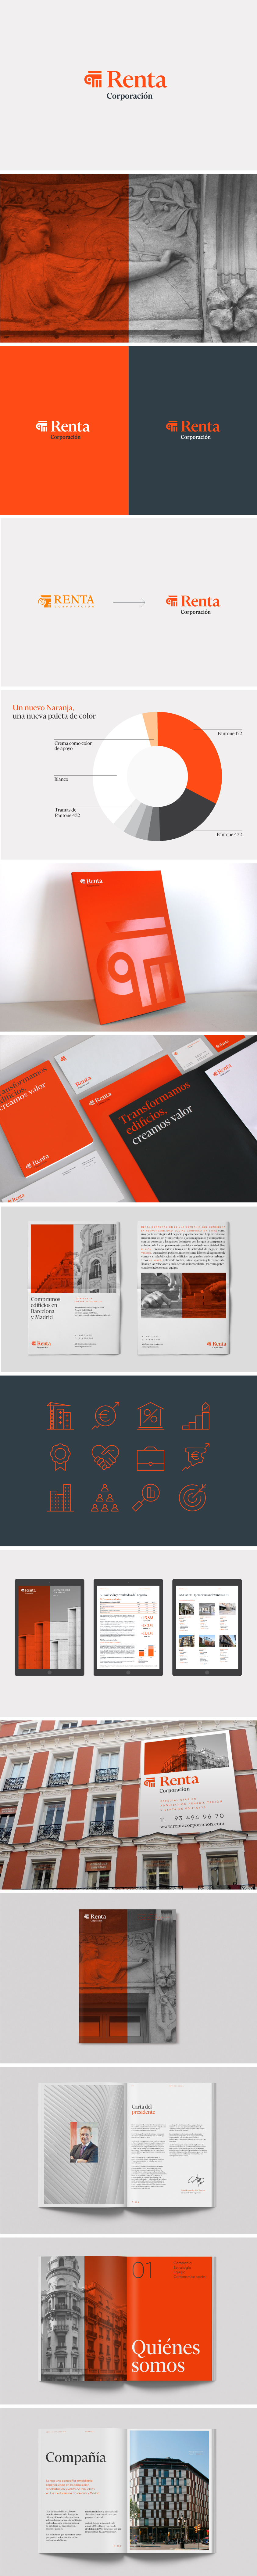 Diseño_CASE_RENTA.jpg